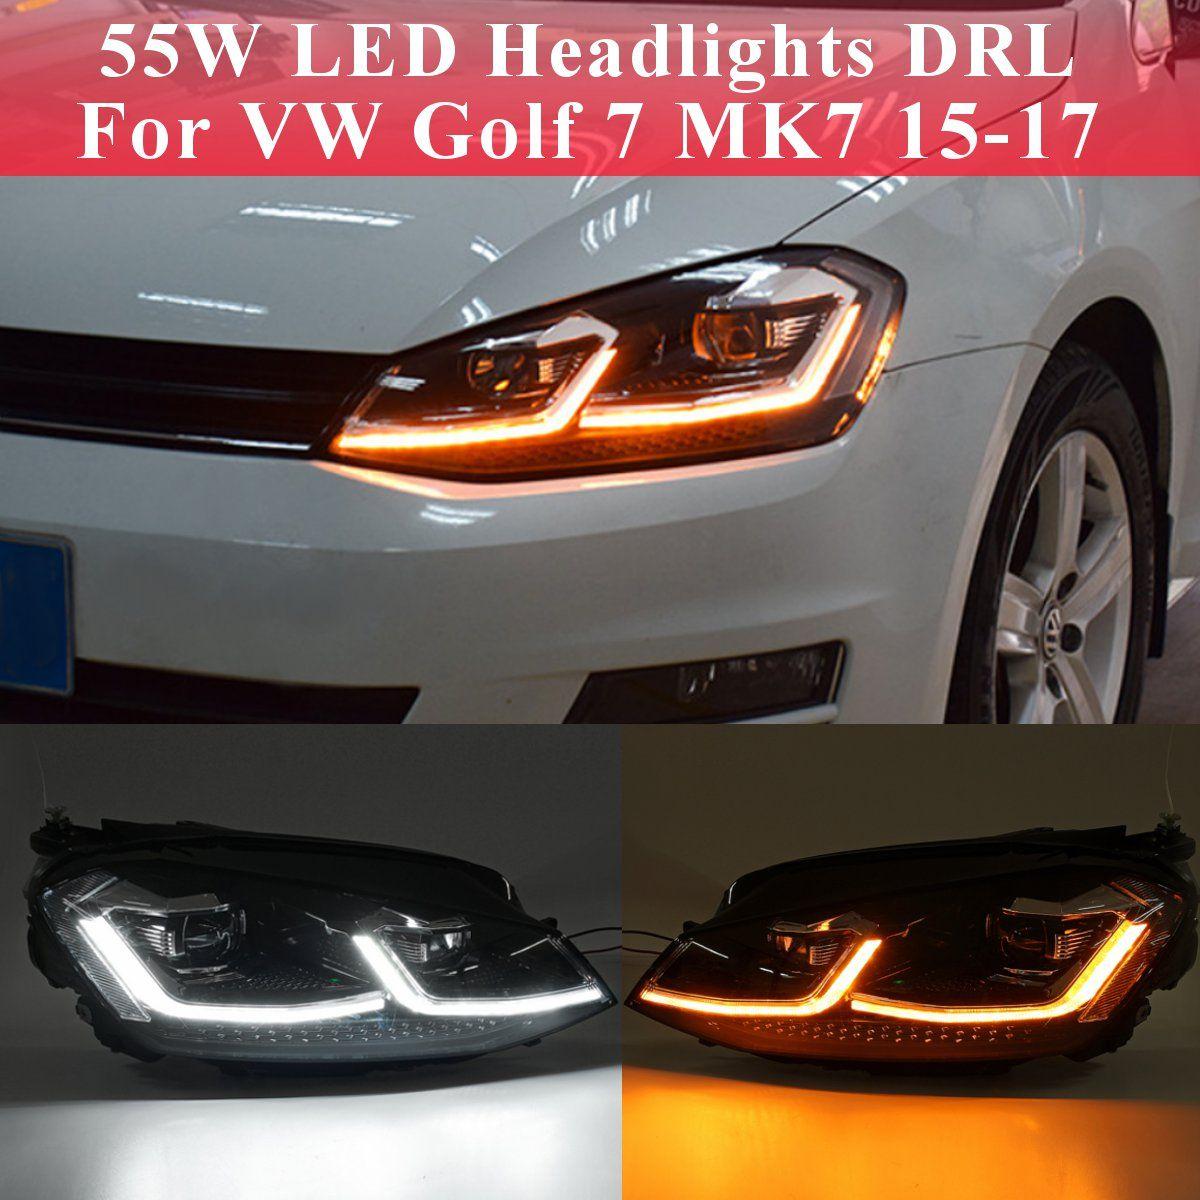 Paar Vorne Links/Rechts Klar LED Scheinwerfer Kopf Lampe DRL Objektiv Doppel Strahl HID Für VW Golf 7 MK7 2015 2016 2017 auto Kopf Lampe cas